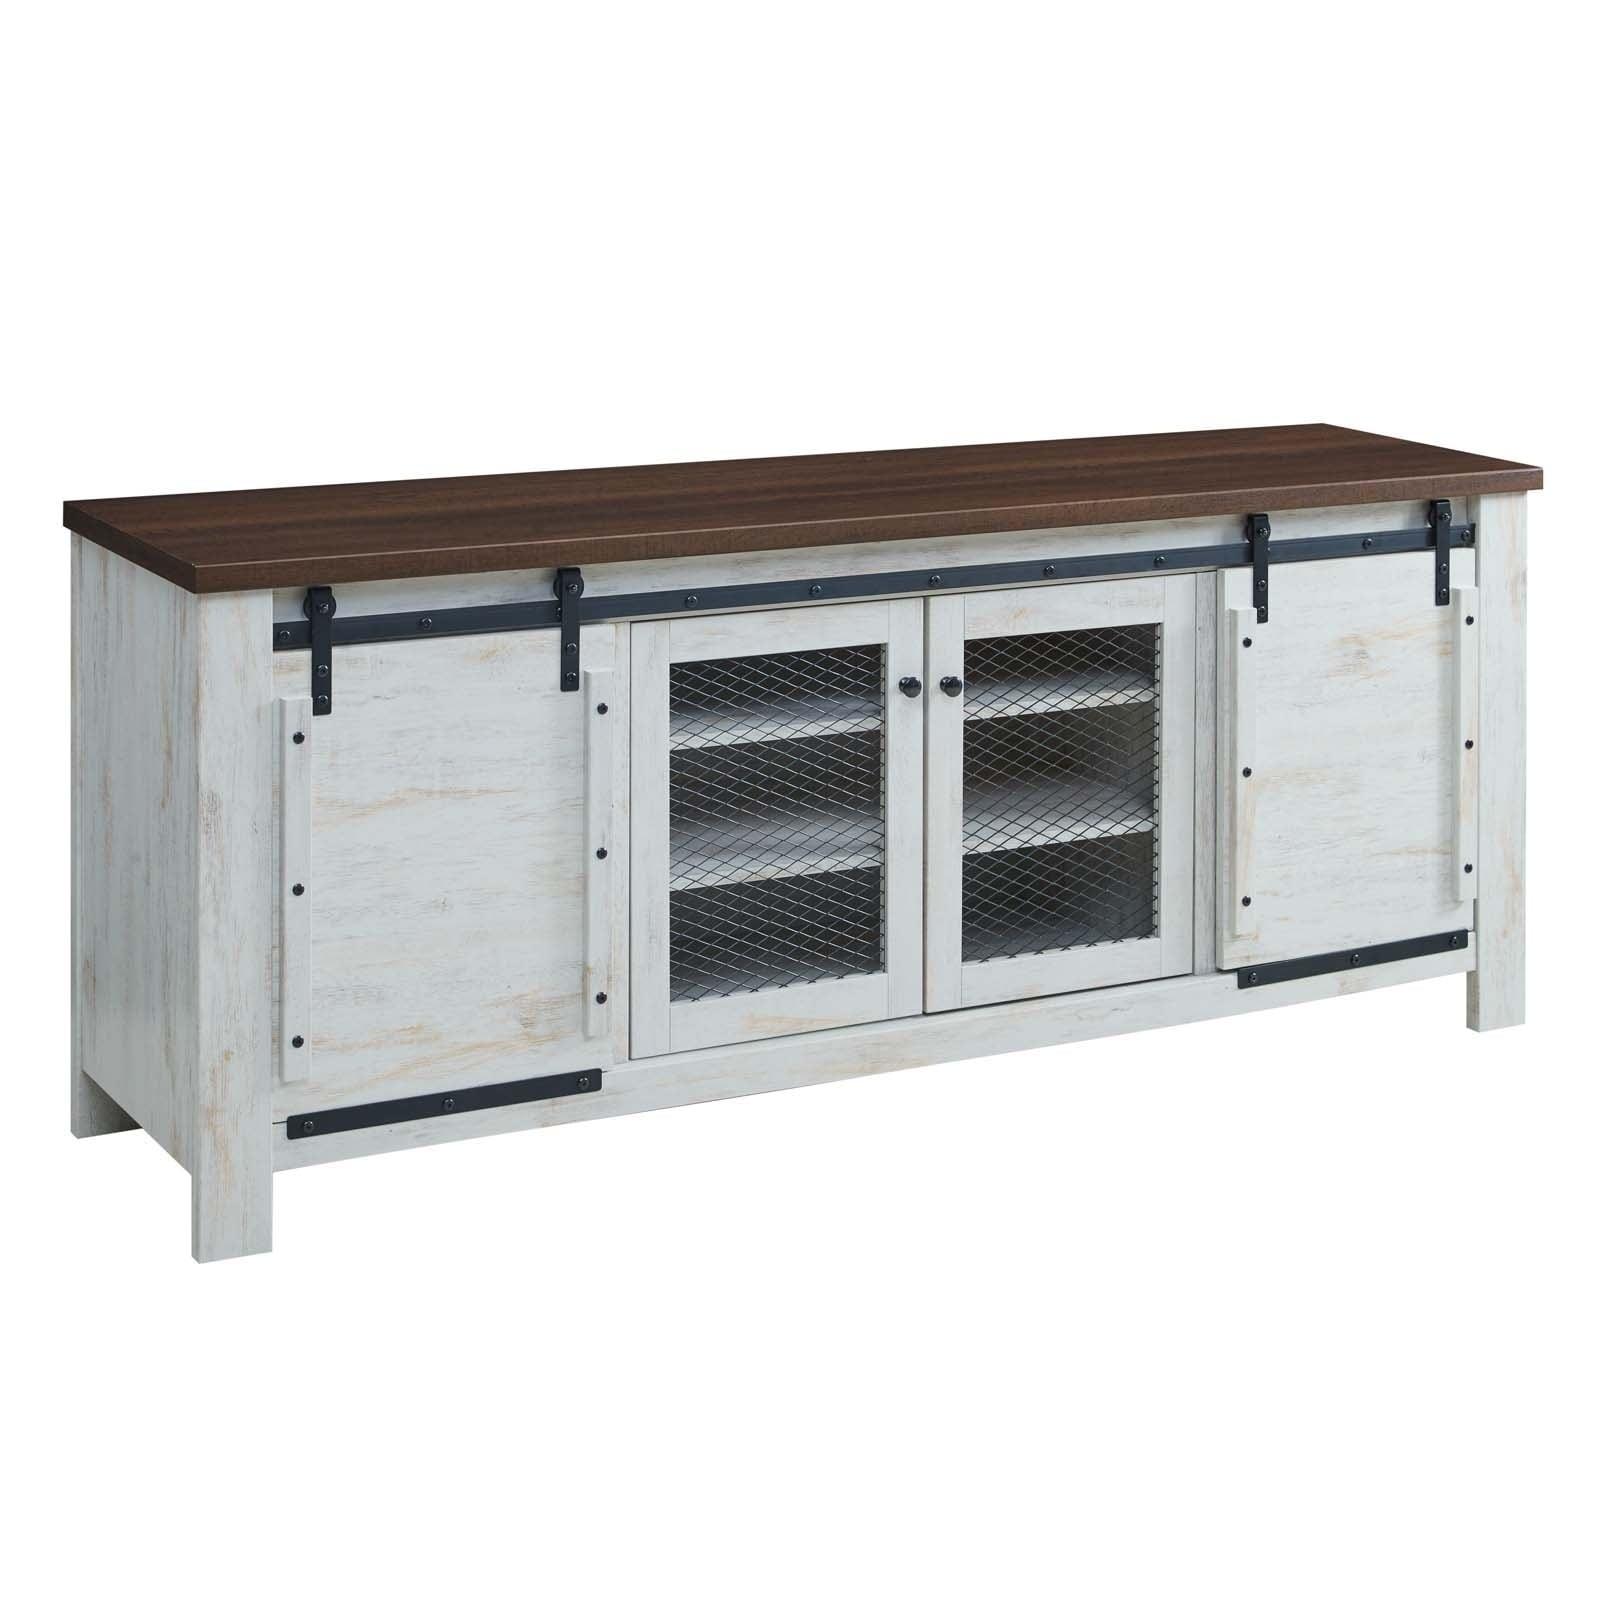 Bennington 70 Rustic Sliding Door Buffet Table Sideboard